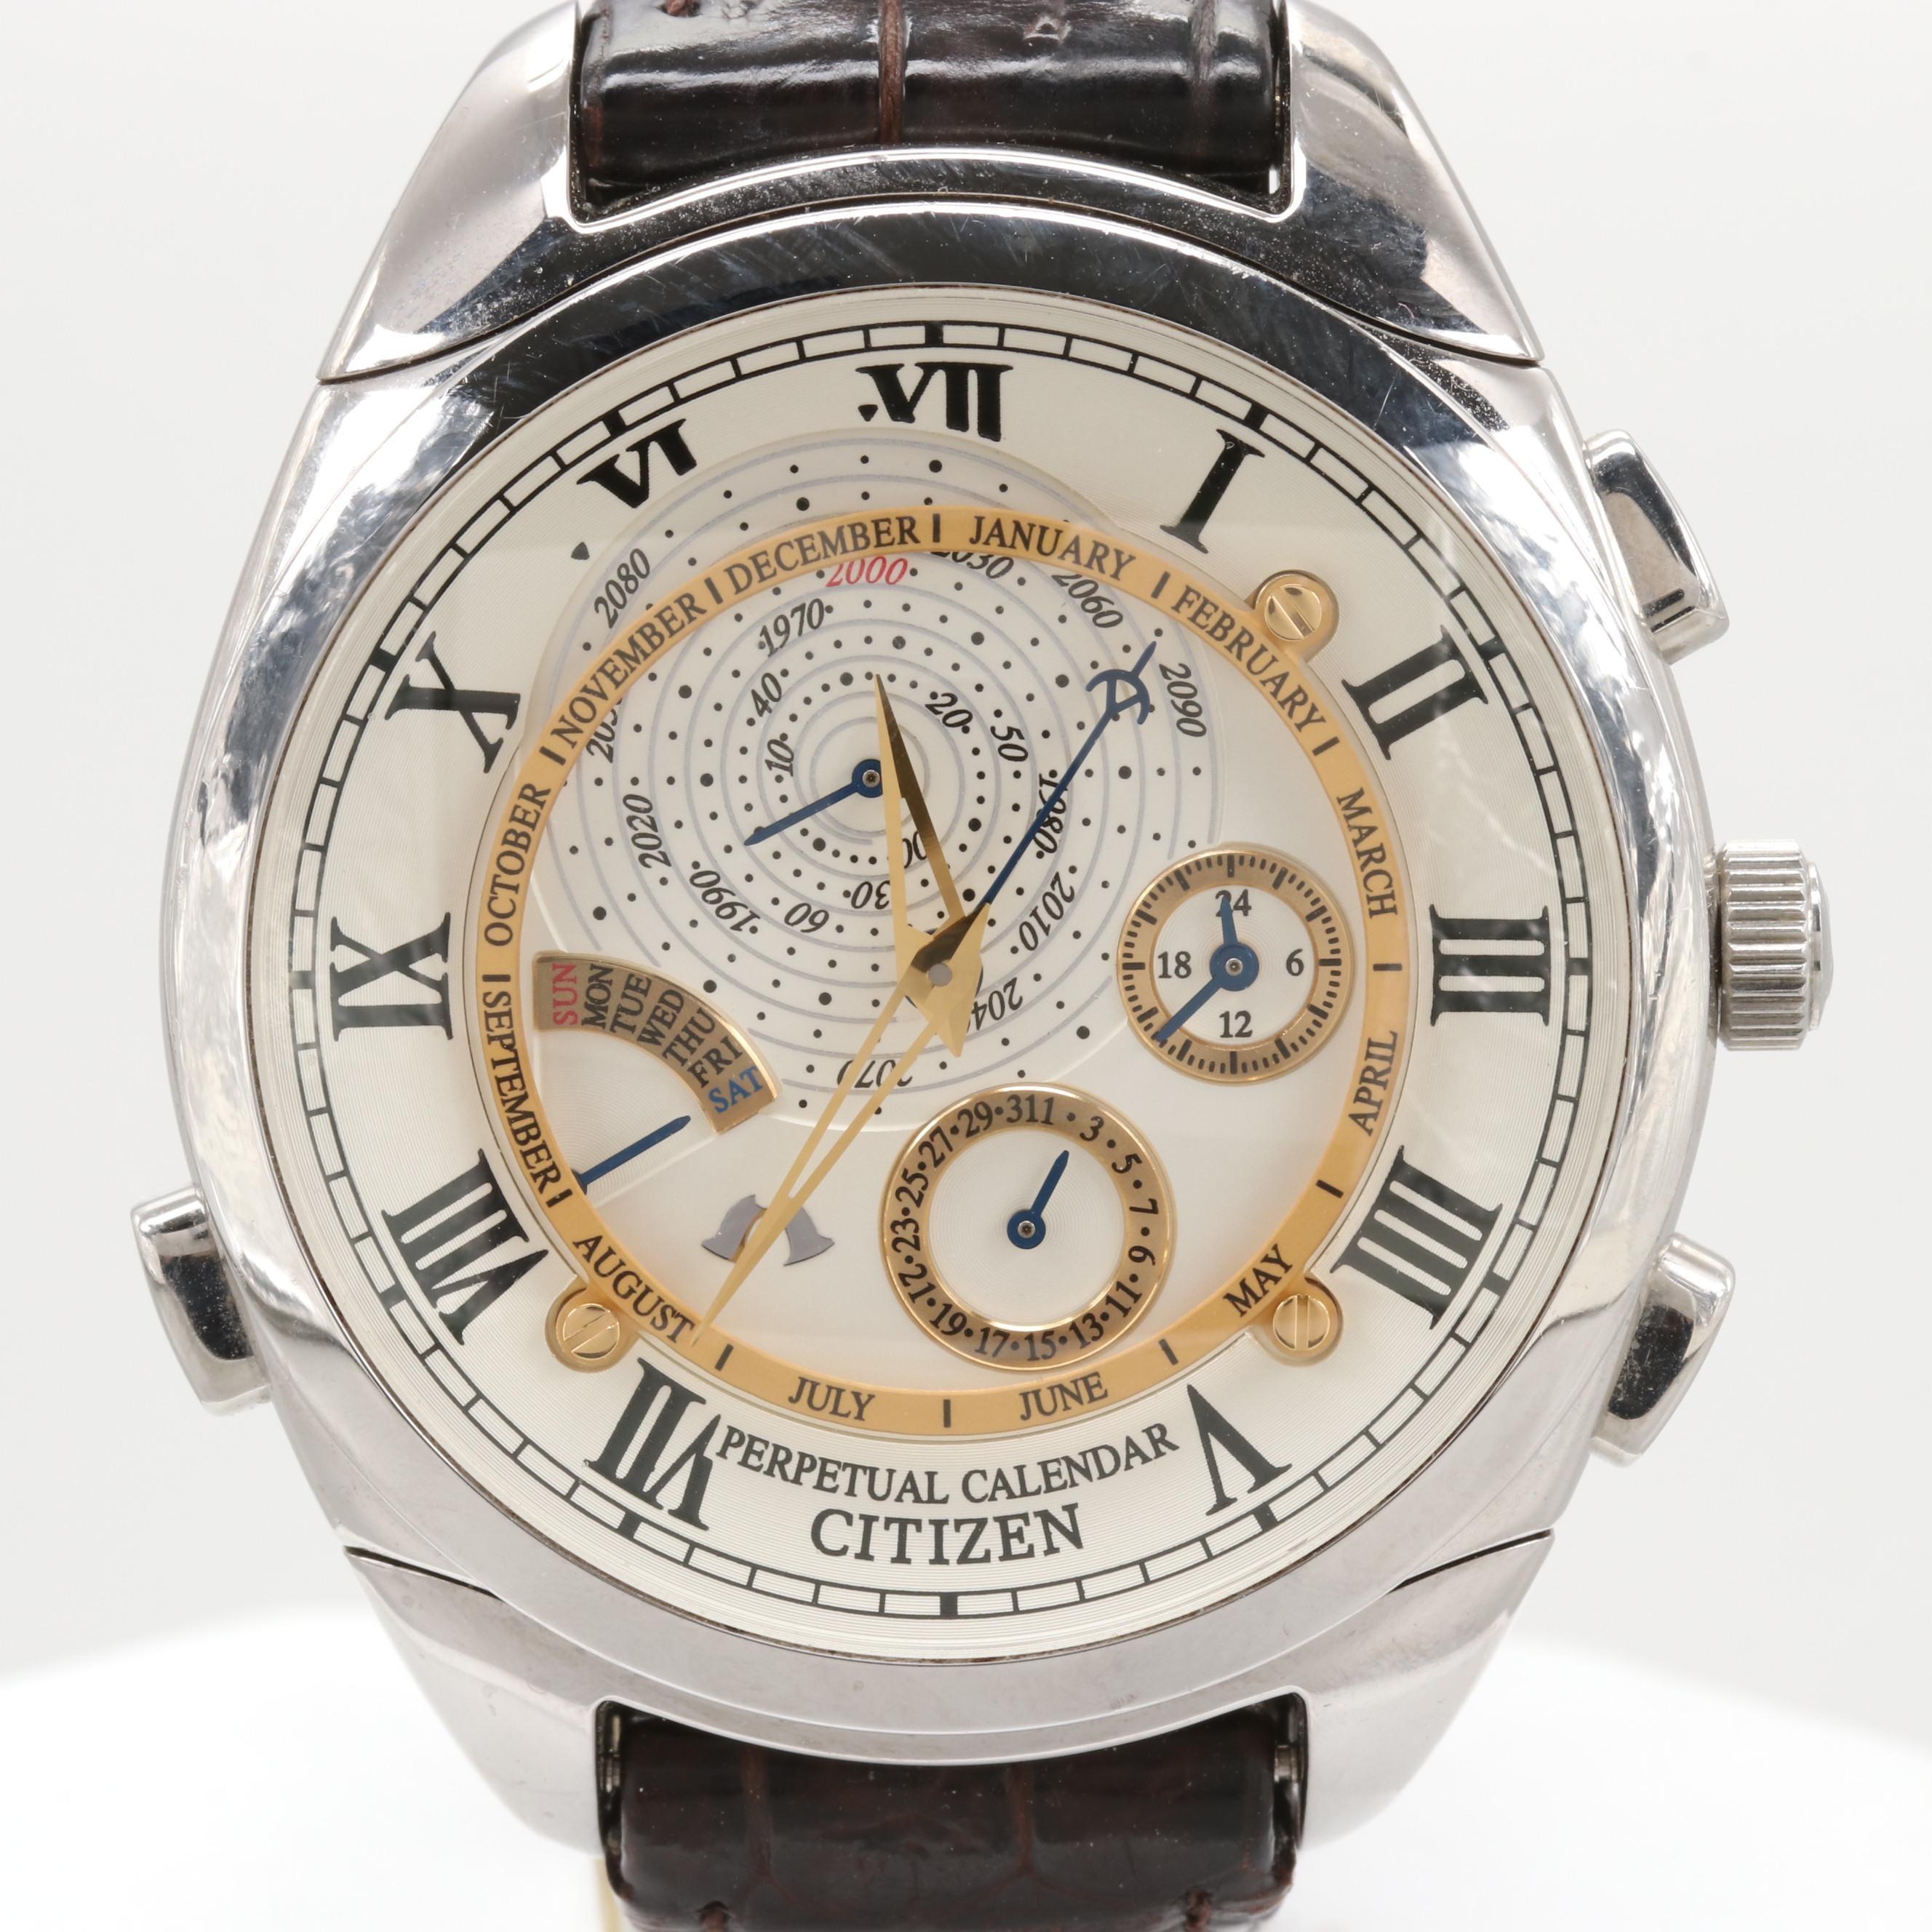 Citizen Campanola 101 Wristwatch With Perpetual Calendar